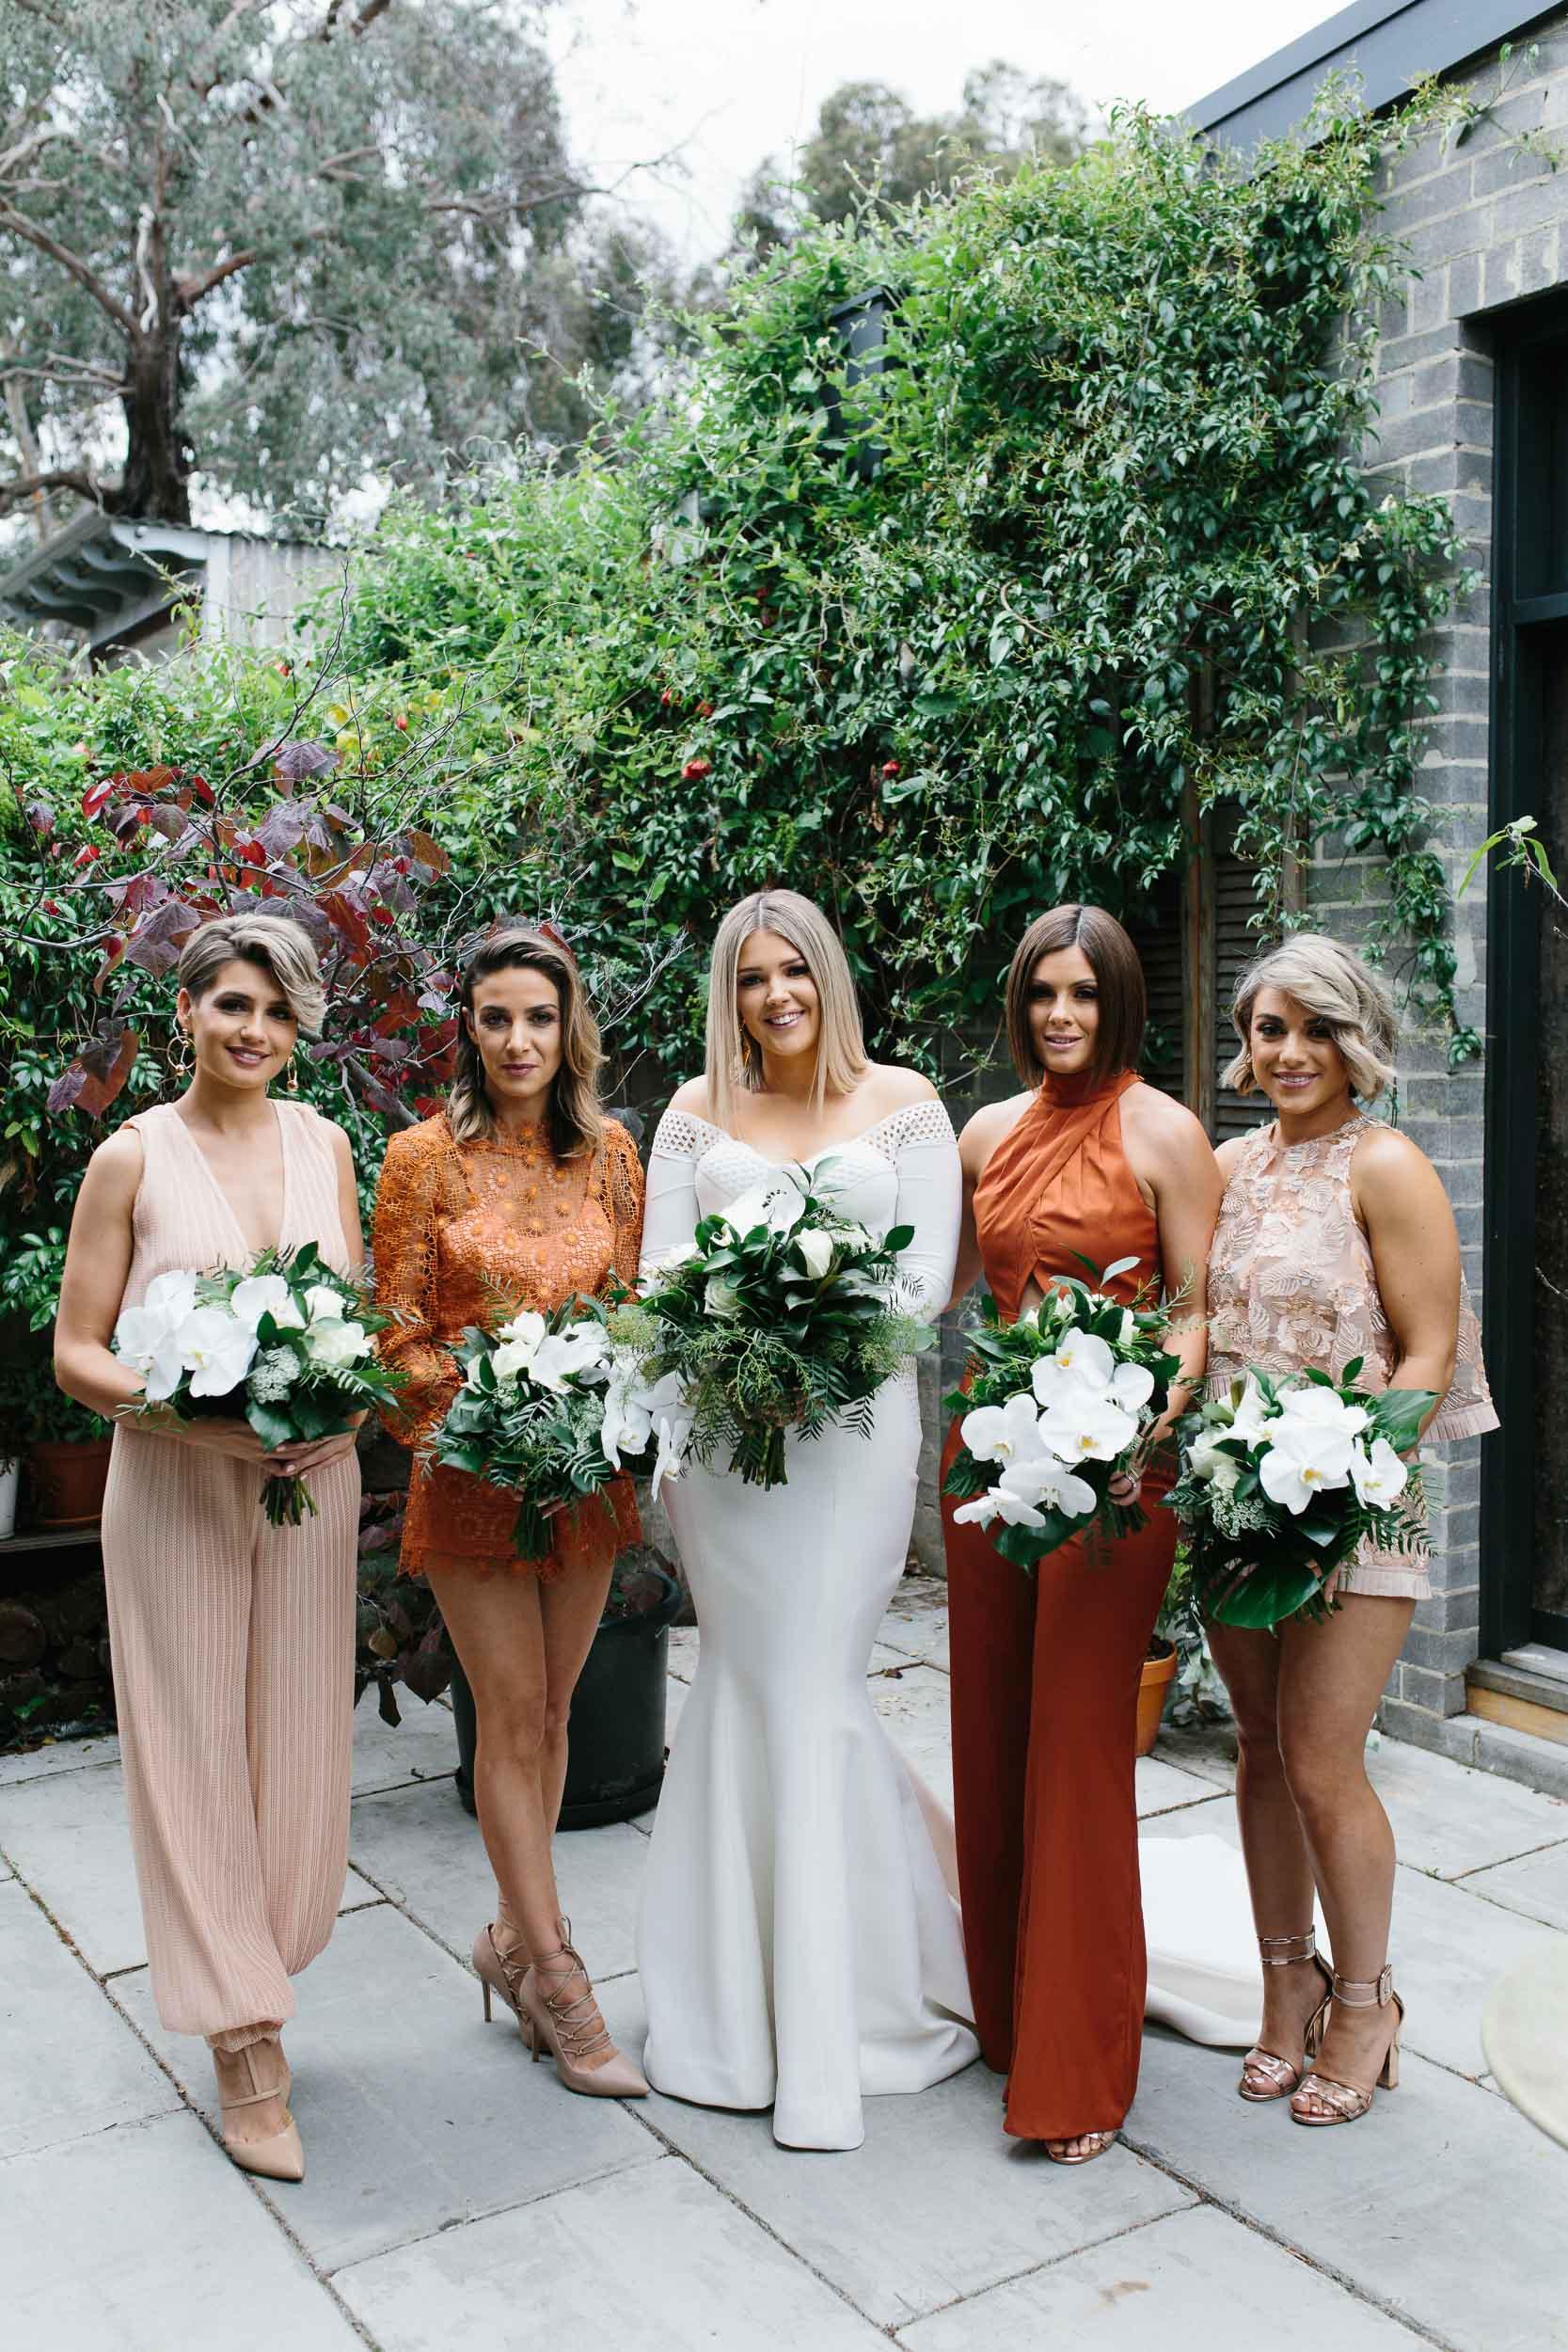 Kas-Richards-Urban-Melbourne-Wedding-Jason-Grech-189.jpg